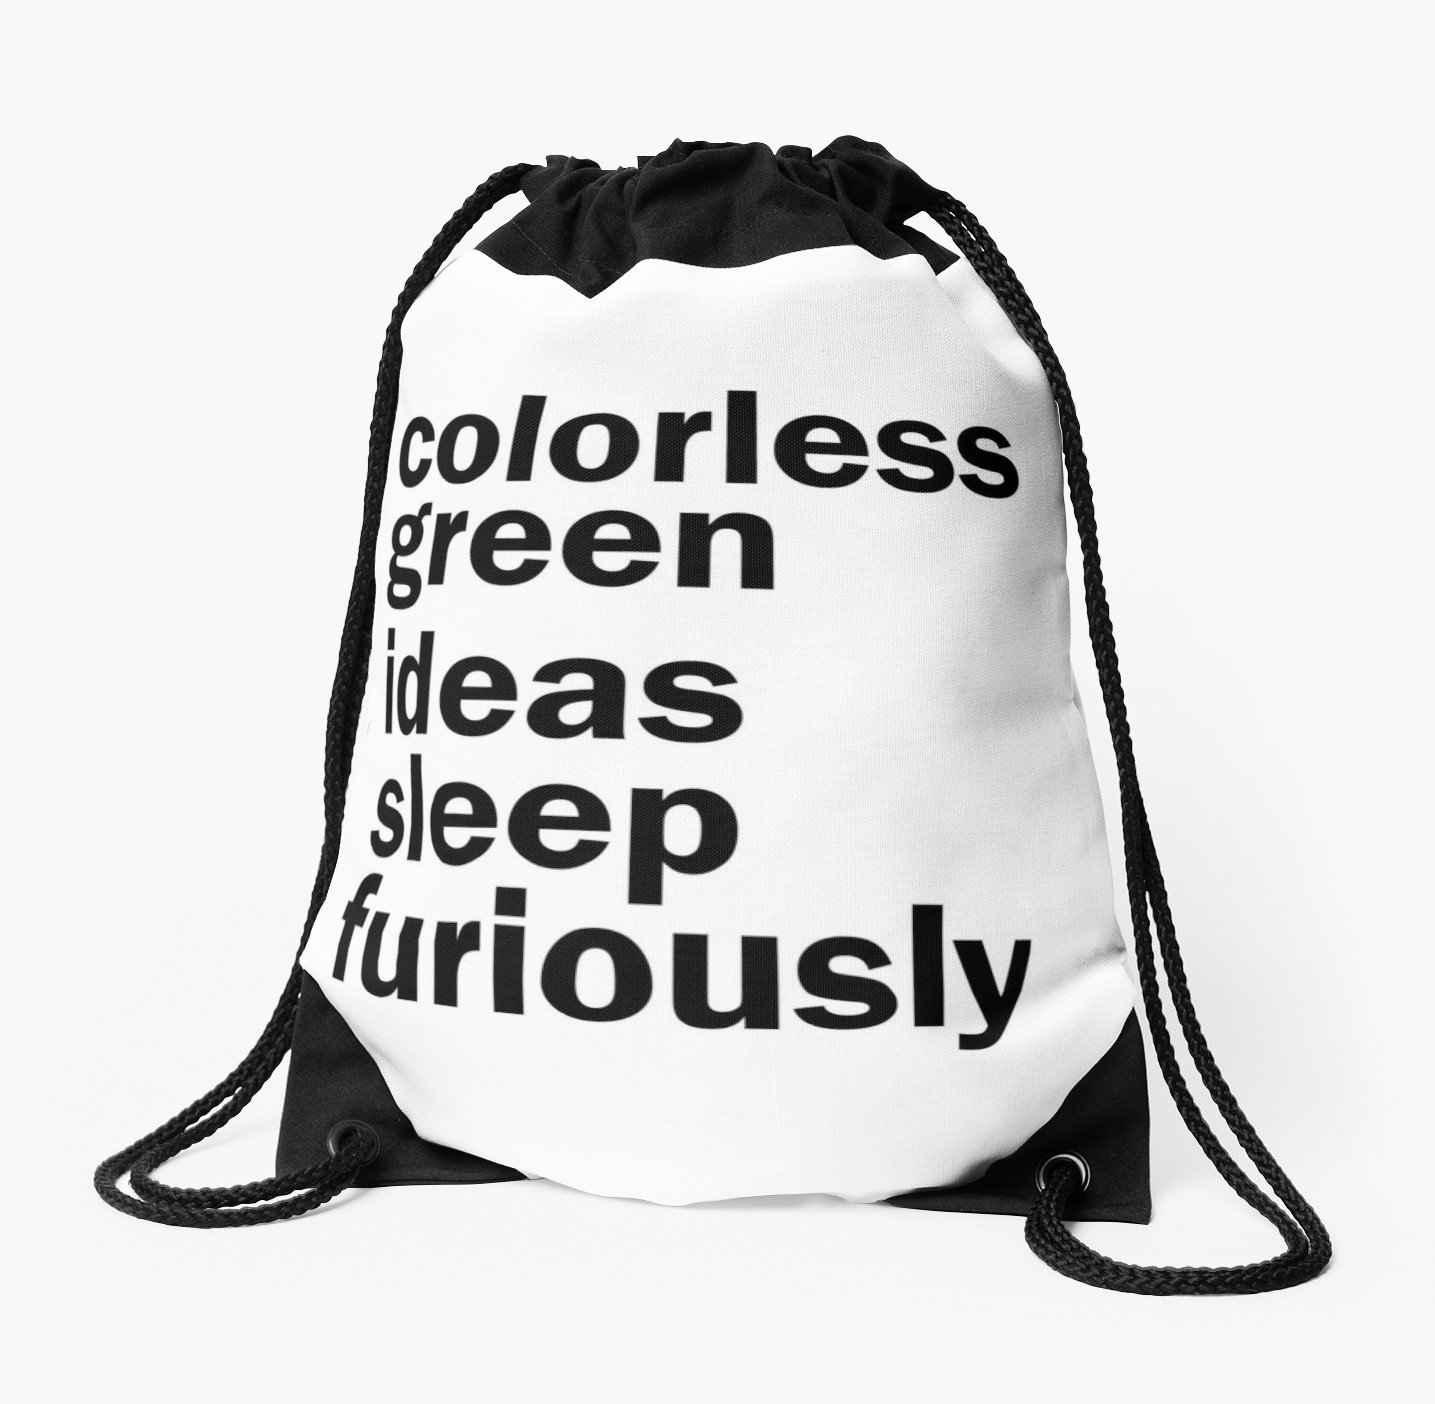 10 Gorgeous Colorless Green Ideas Sleep Furiously colorless green ideas sleep furiously white linguistics 2020